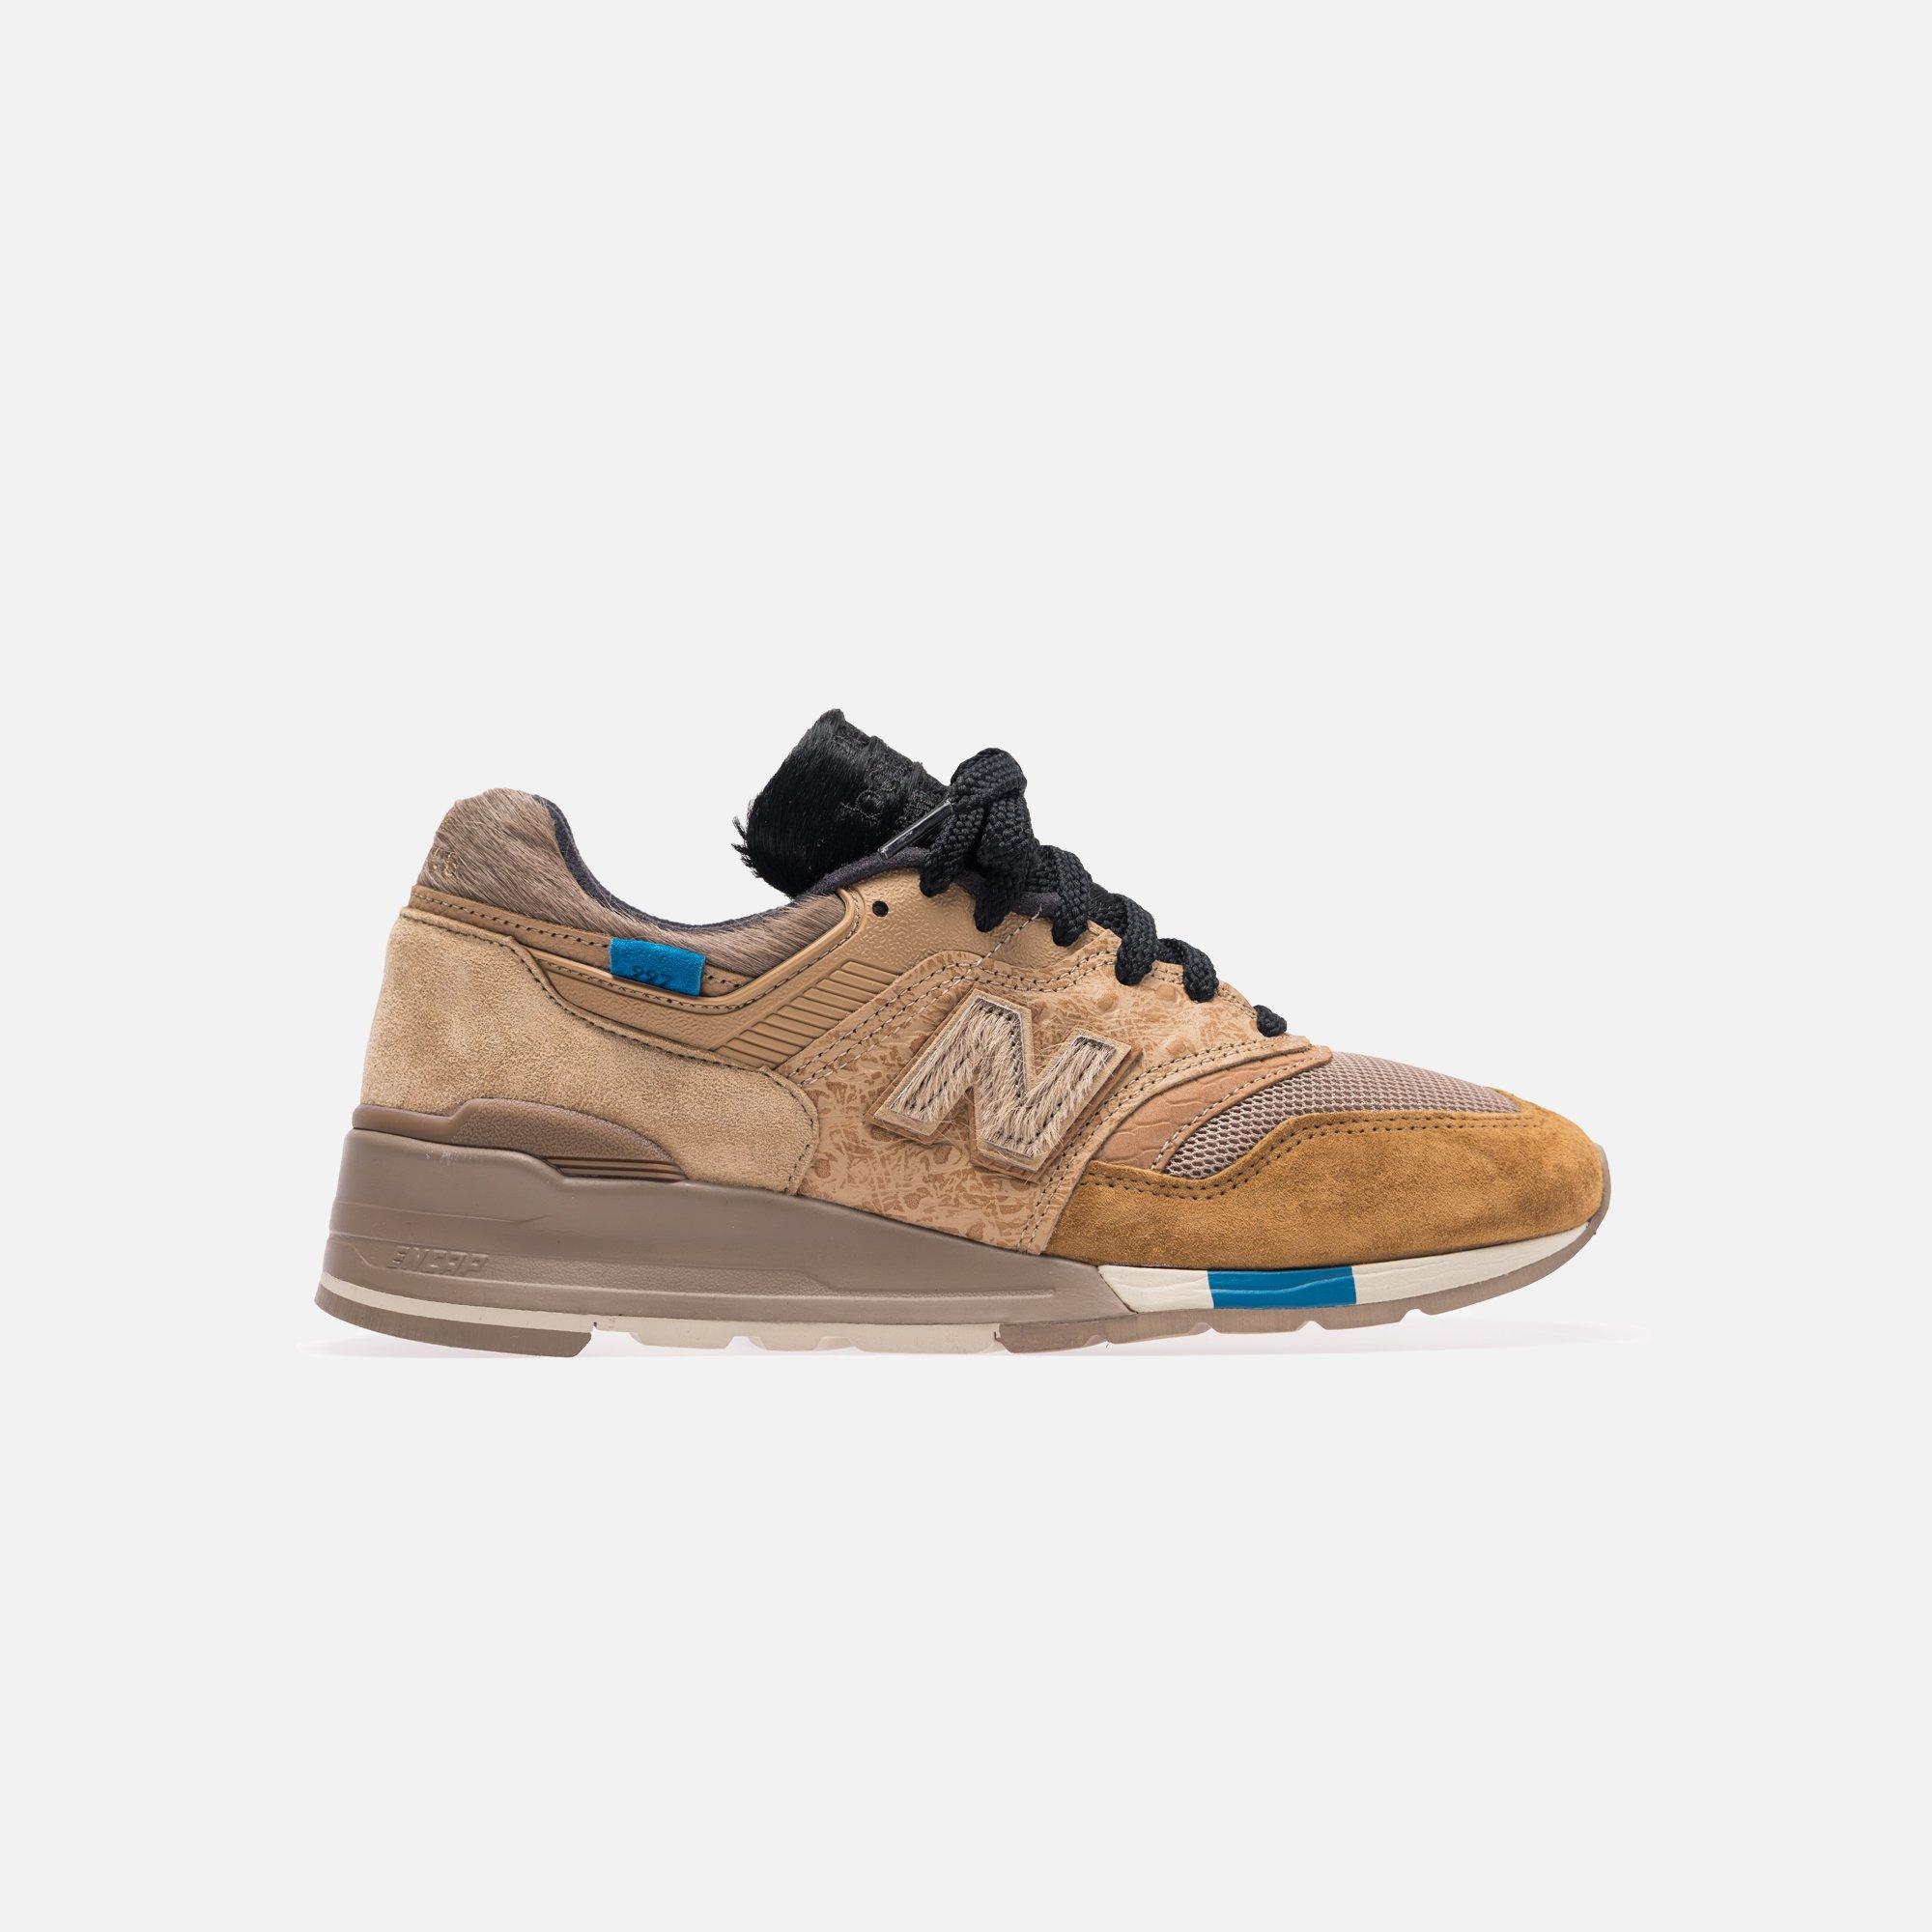 timeless design 50cbe 22de0 Kith x New Balance x Nonnative sneakers